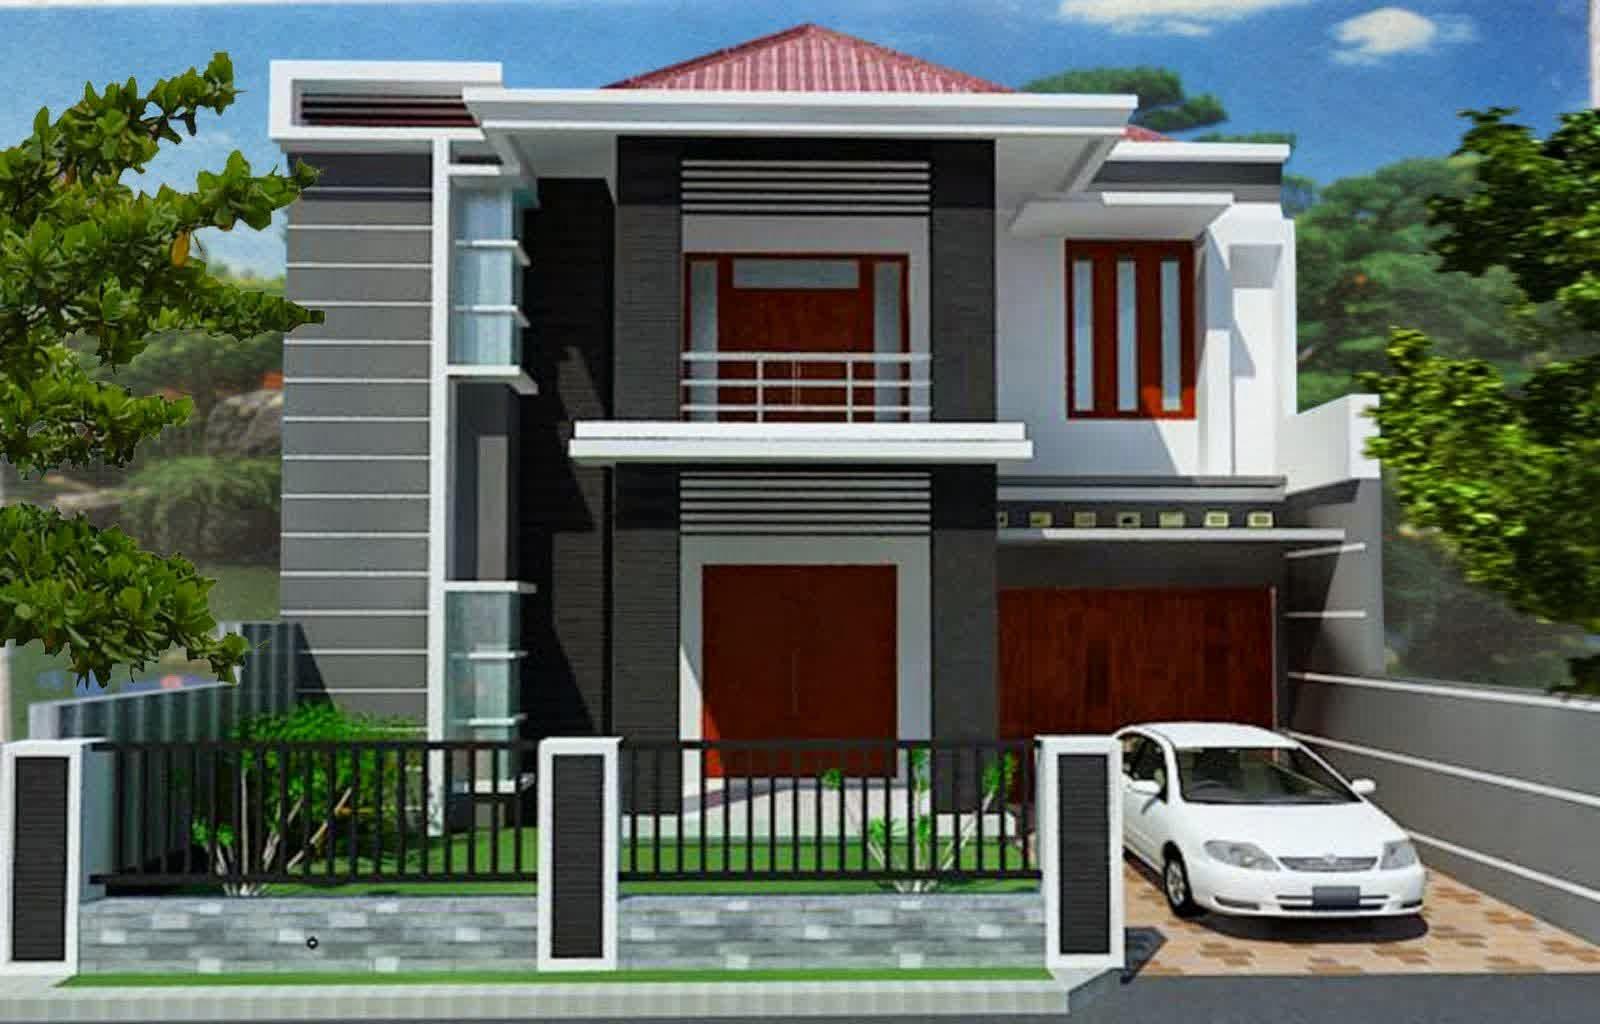 55 Gambar Rumah Minimalis Lantai 2 Atap Limas Gratis Terbaru